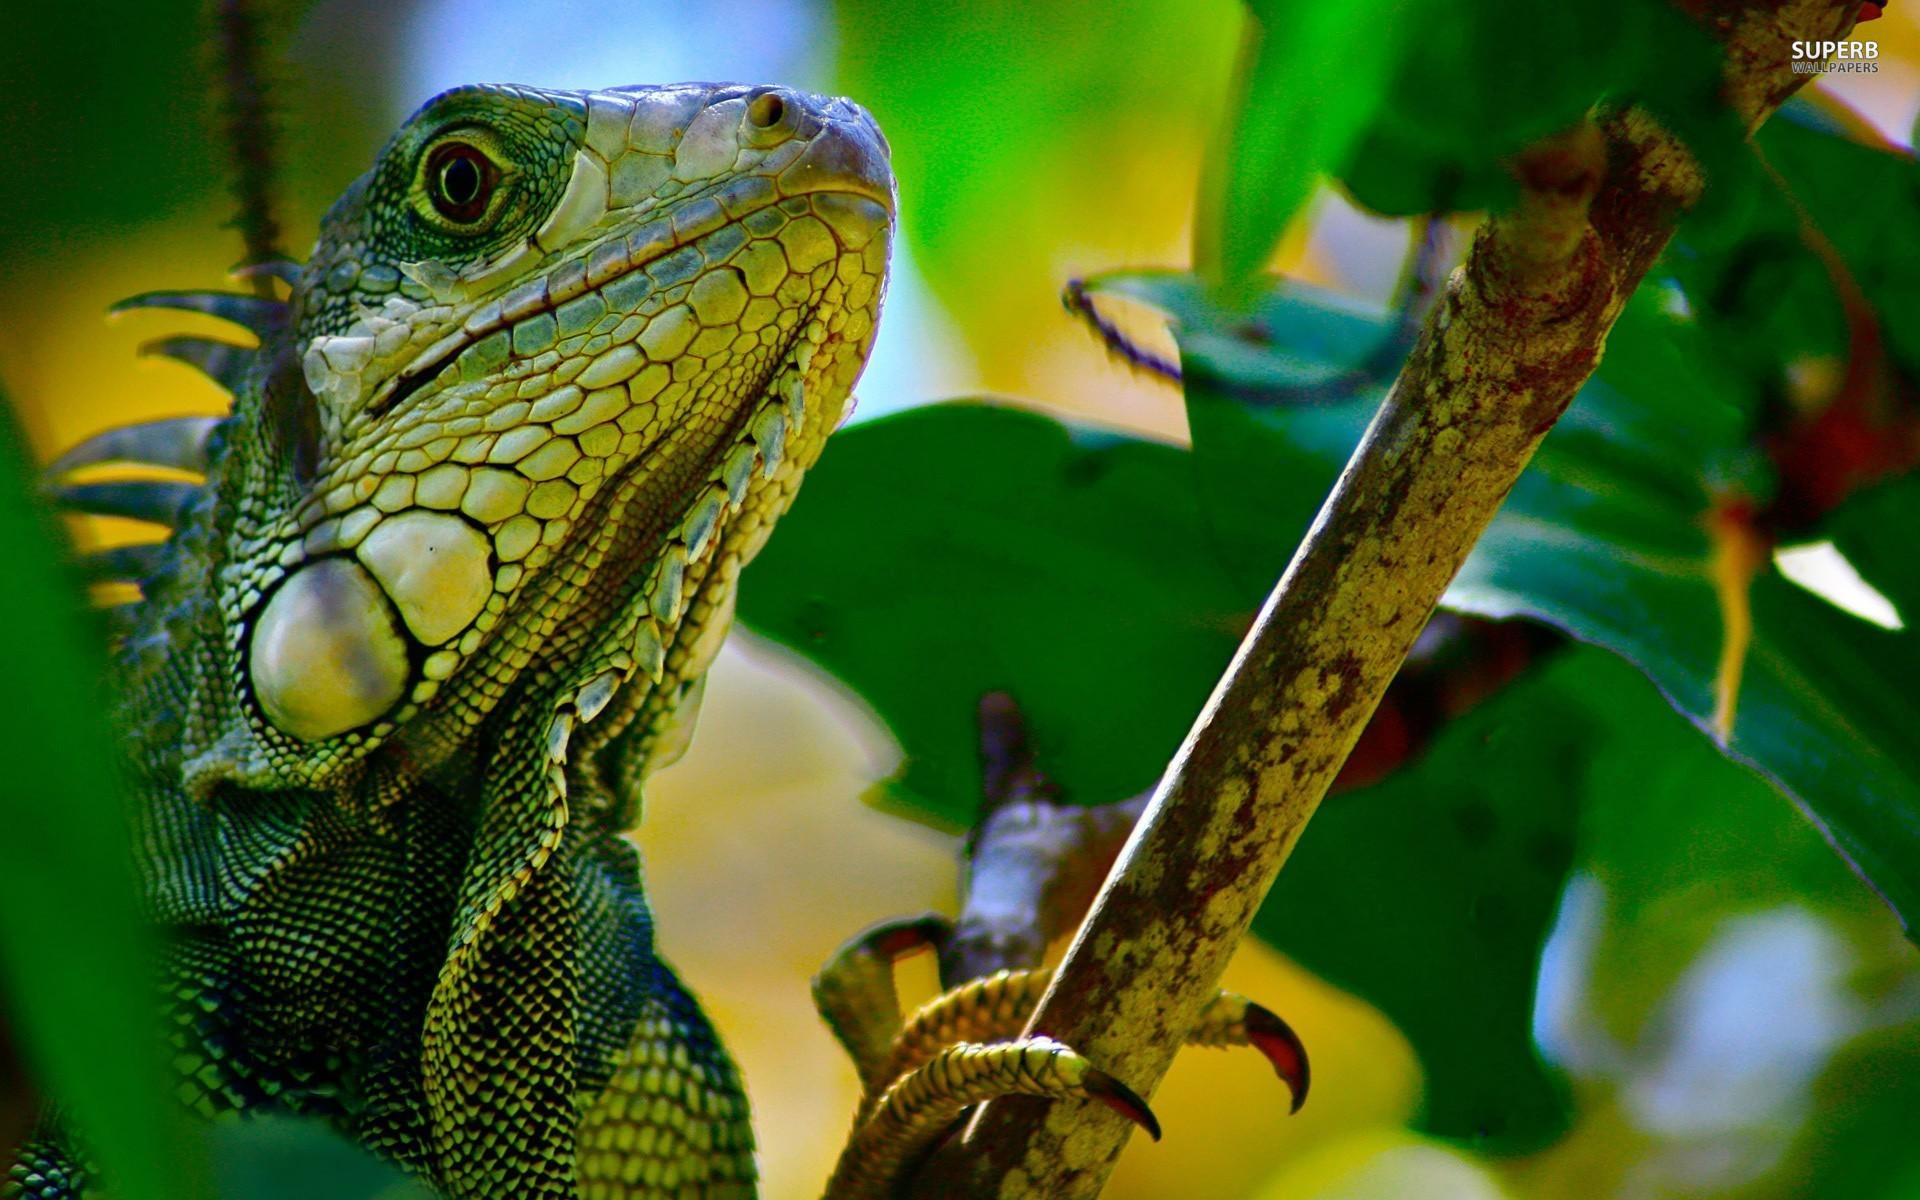 H D Reptiles Green Iguana Wallpaper...